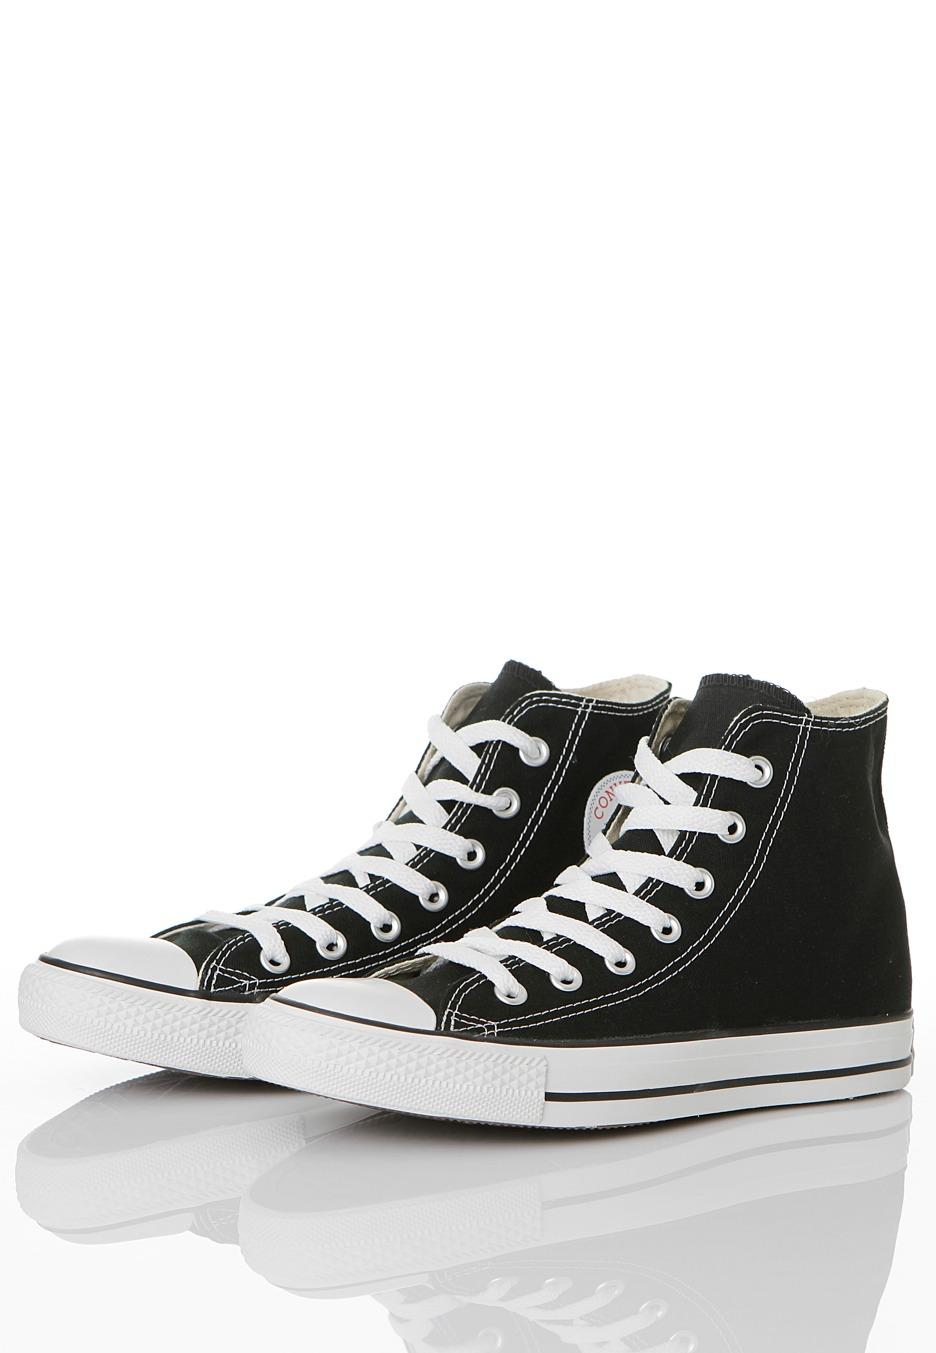 Converse - Chuck Taylor All Star Hi - Girl Shoes ...